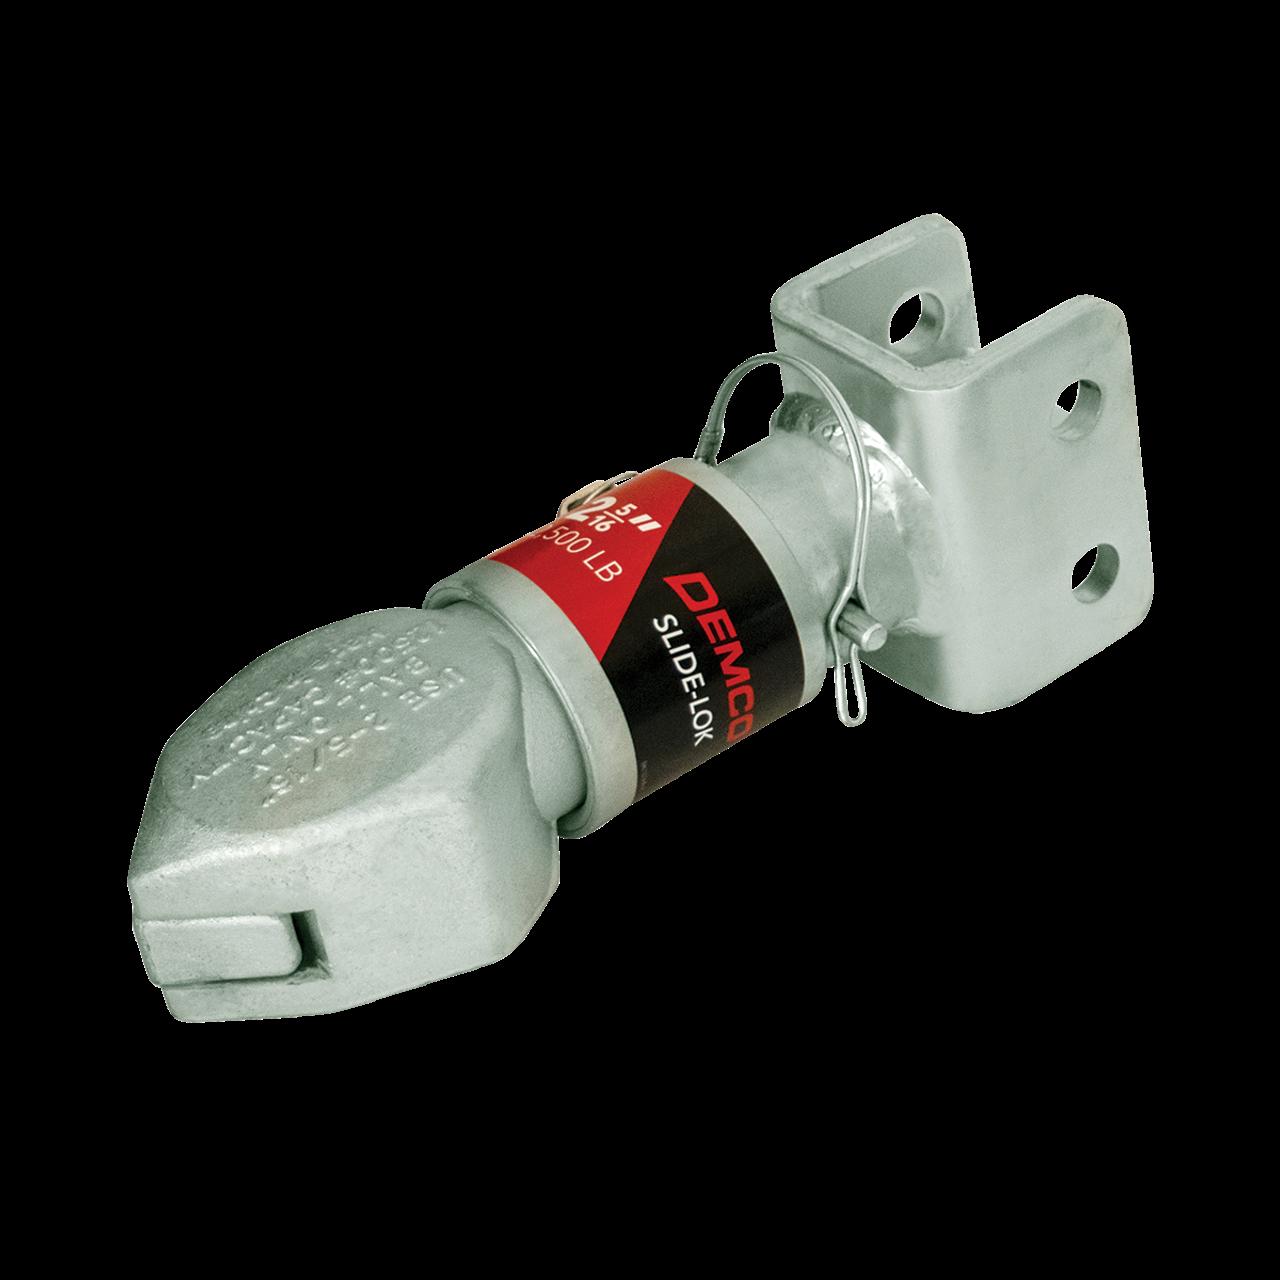 "05557-95 --- Demco Slide-Lock Adjustable 2-5/16"" Coupler - 12,500 lbs Capacity"